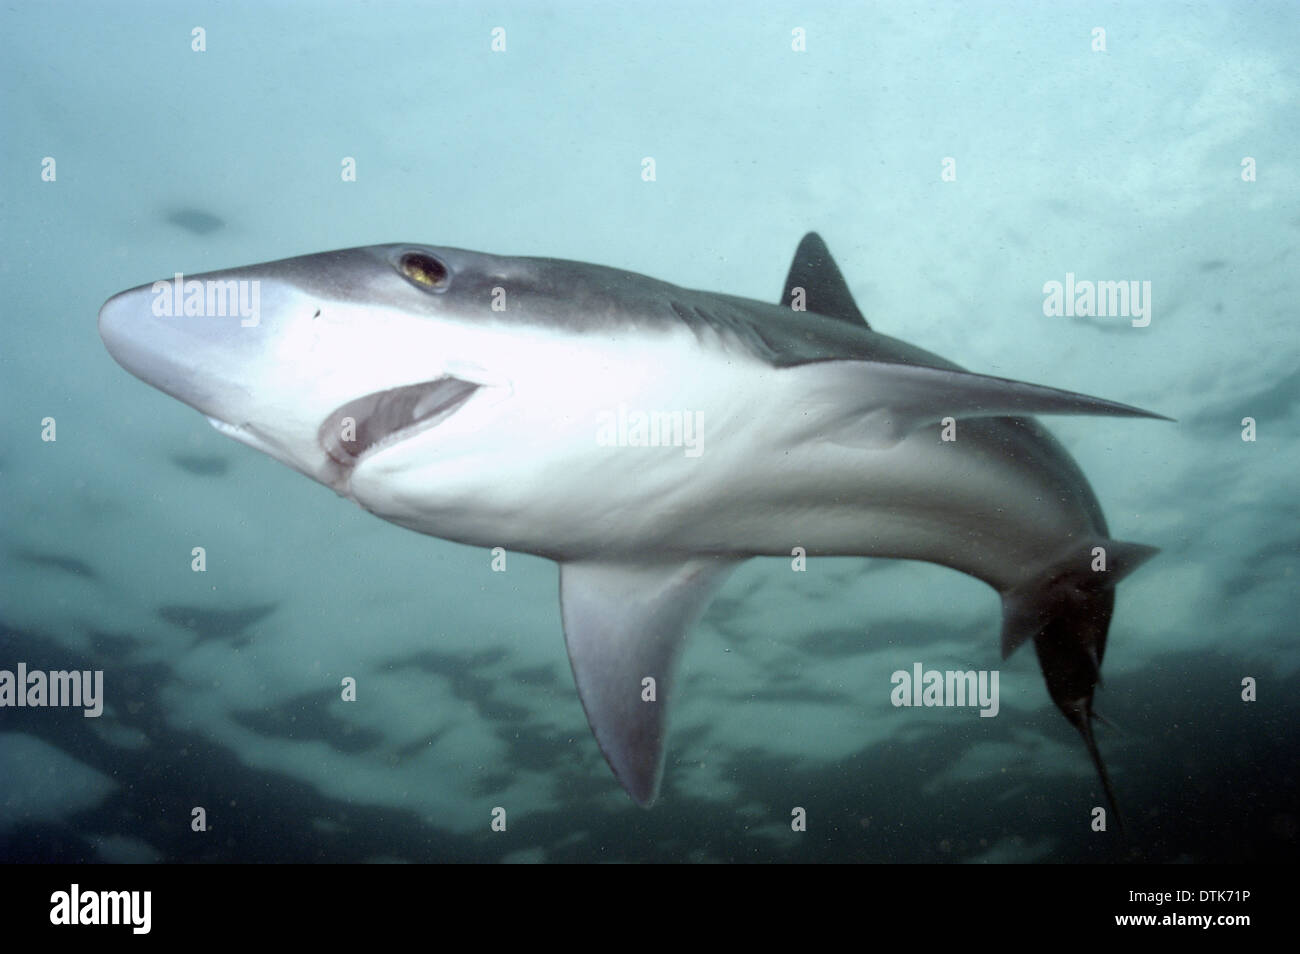 Tope Shark Imágenes De Stock & Tope Shark Fotos De Stock - Alamy